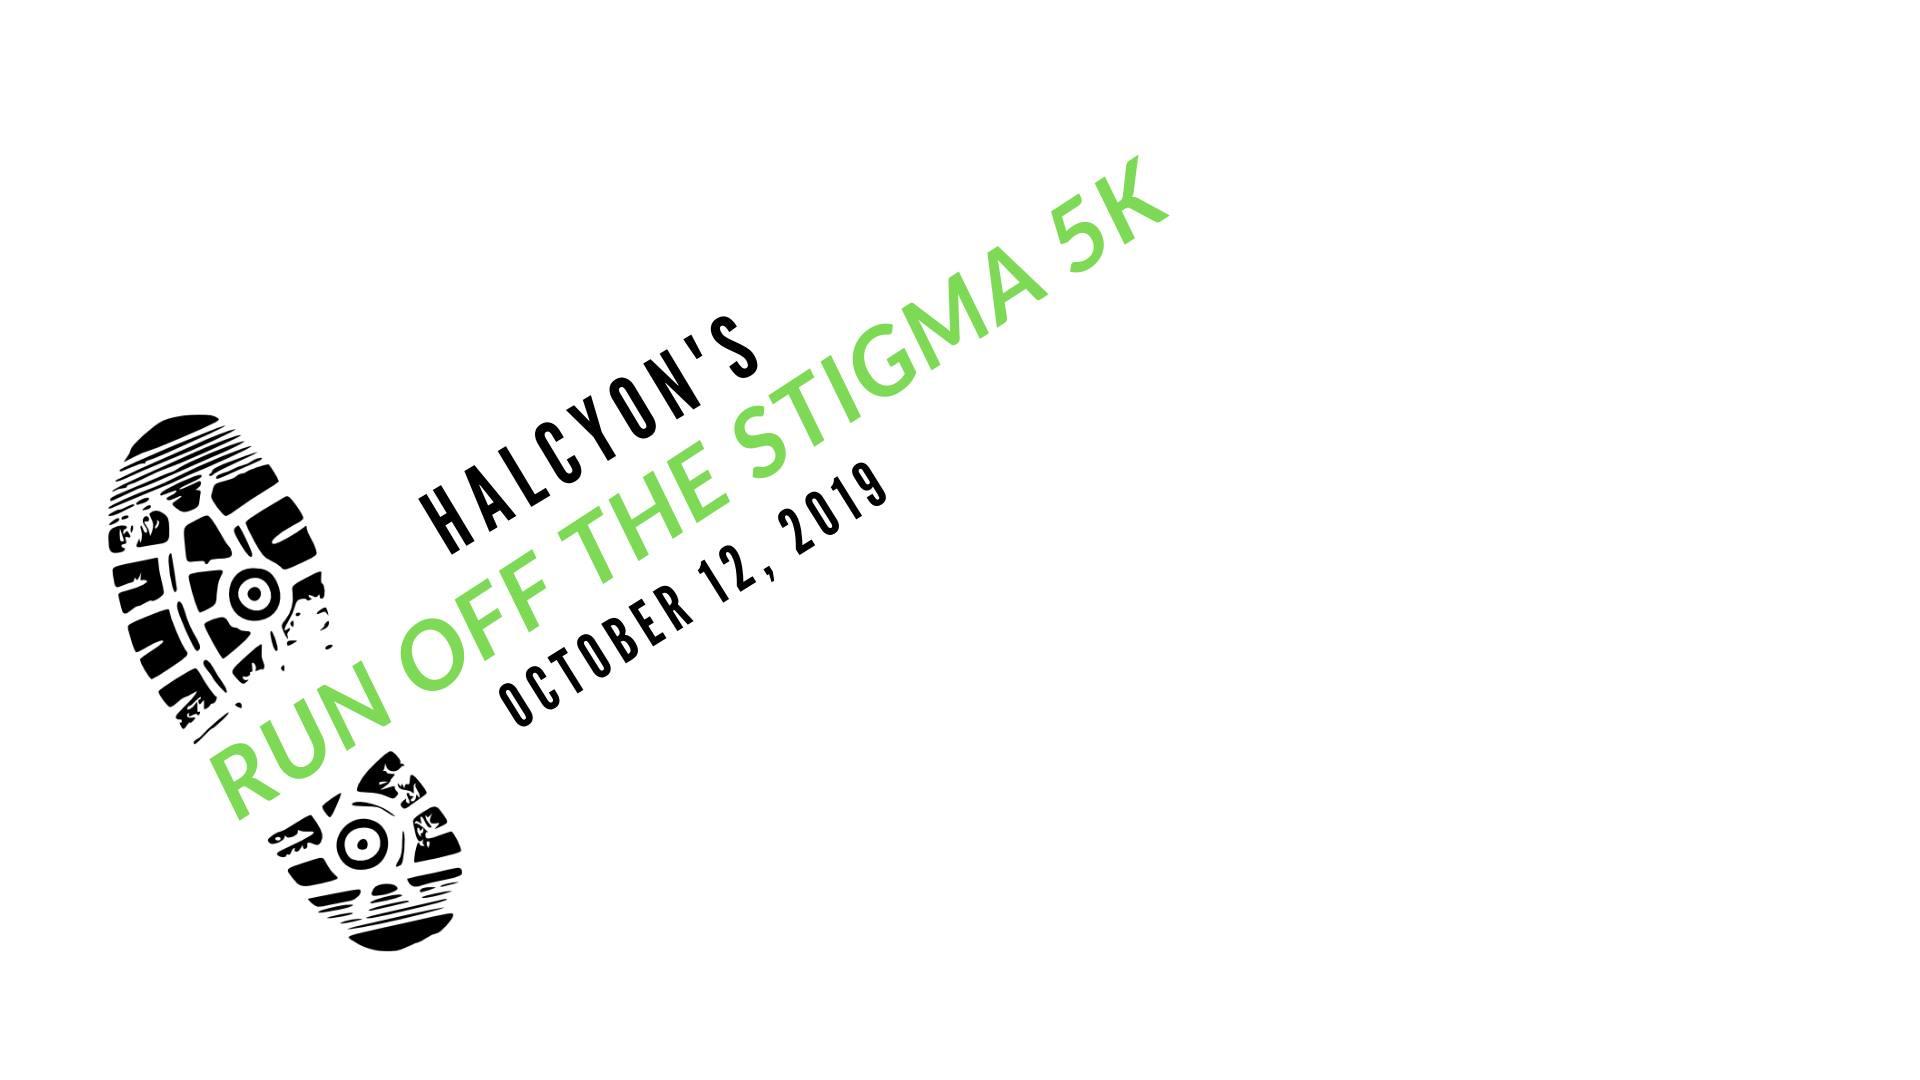 Run Off the Stigma 5K Run/Walk